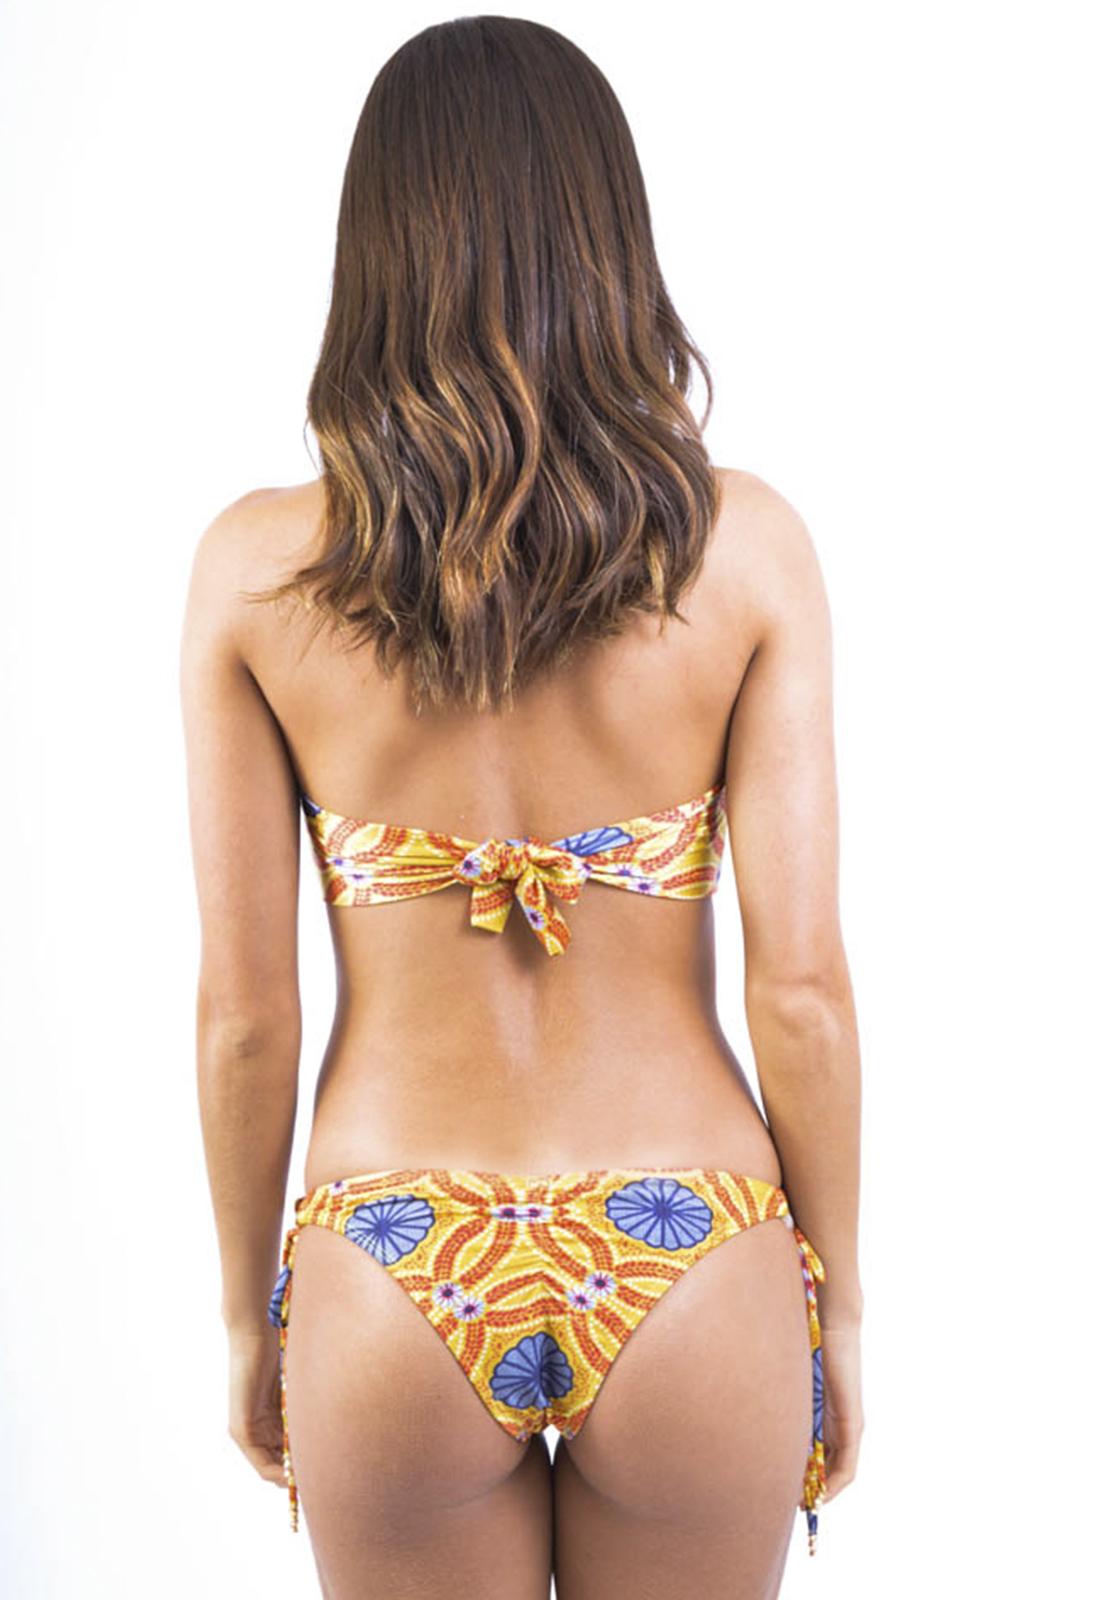 Risa mandala bikini lotion play wet fetish nonnude 2